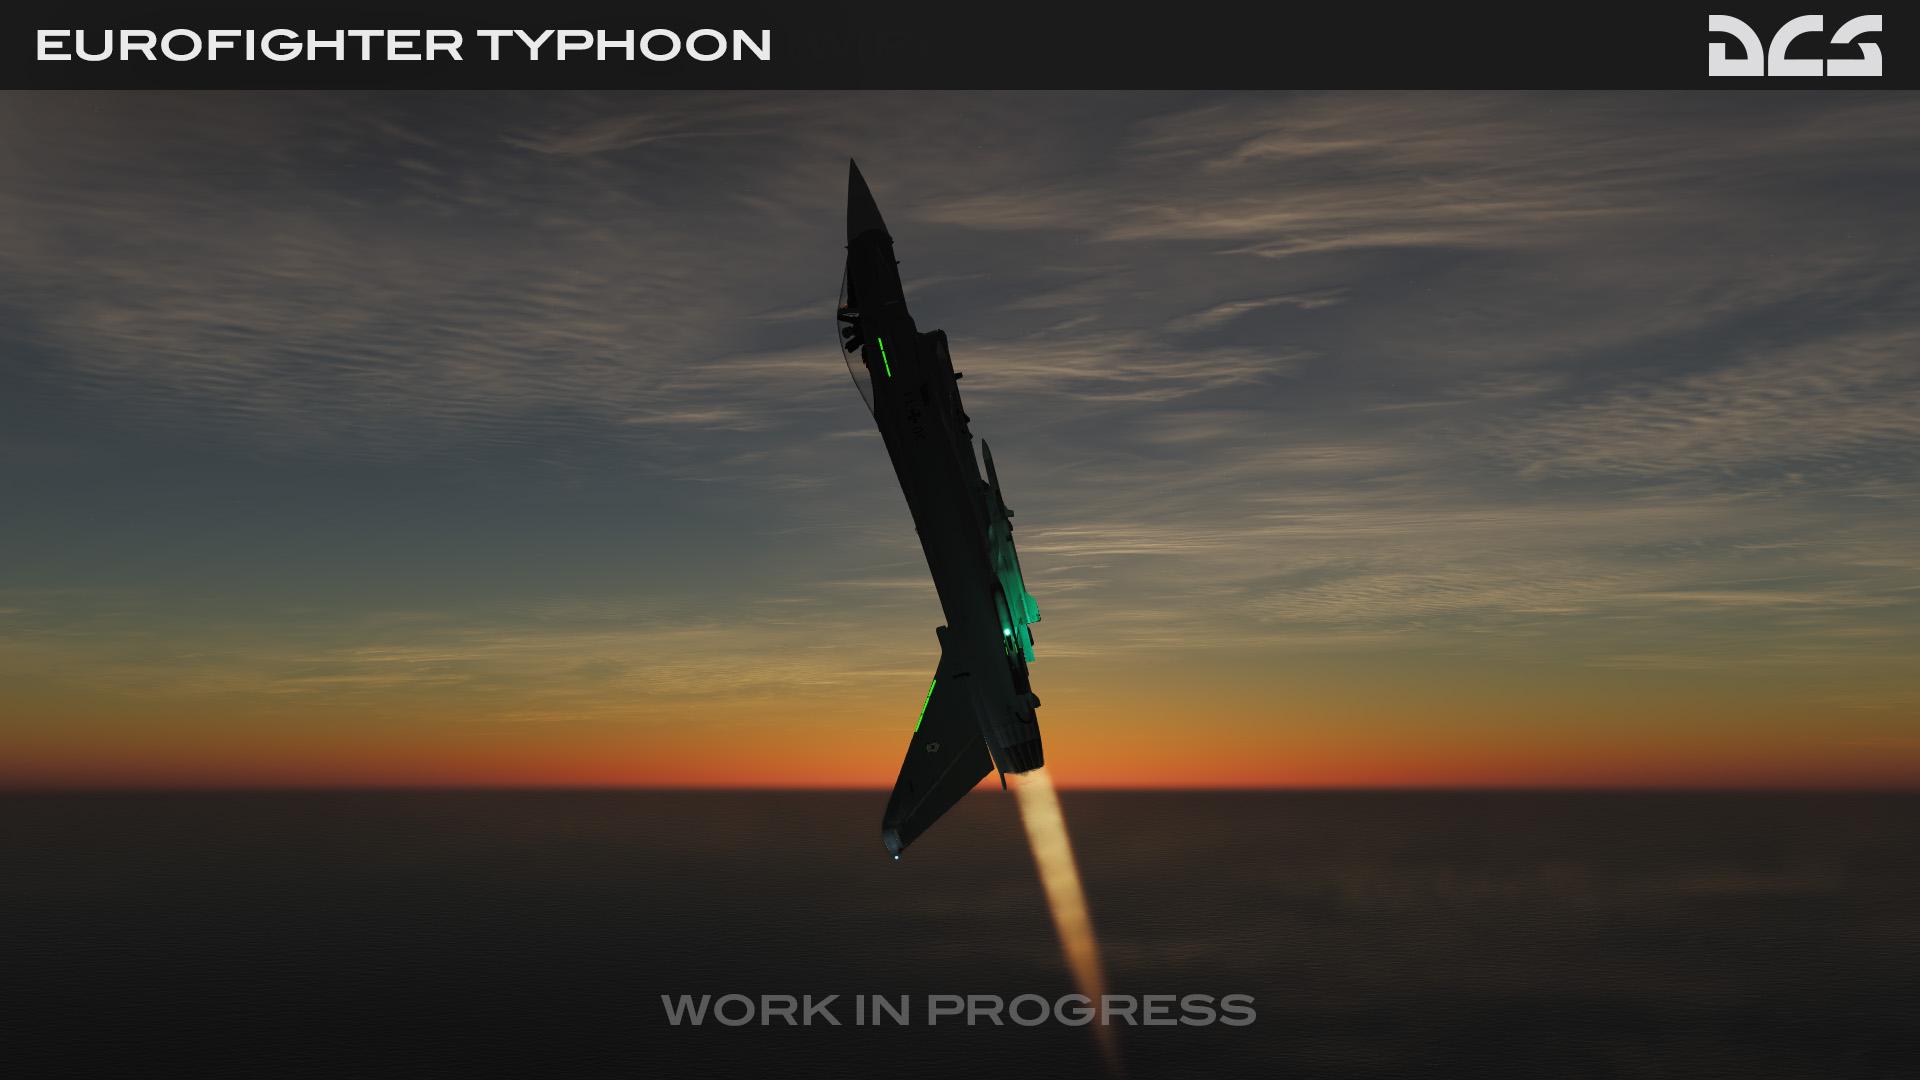 Typhoon by night